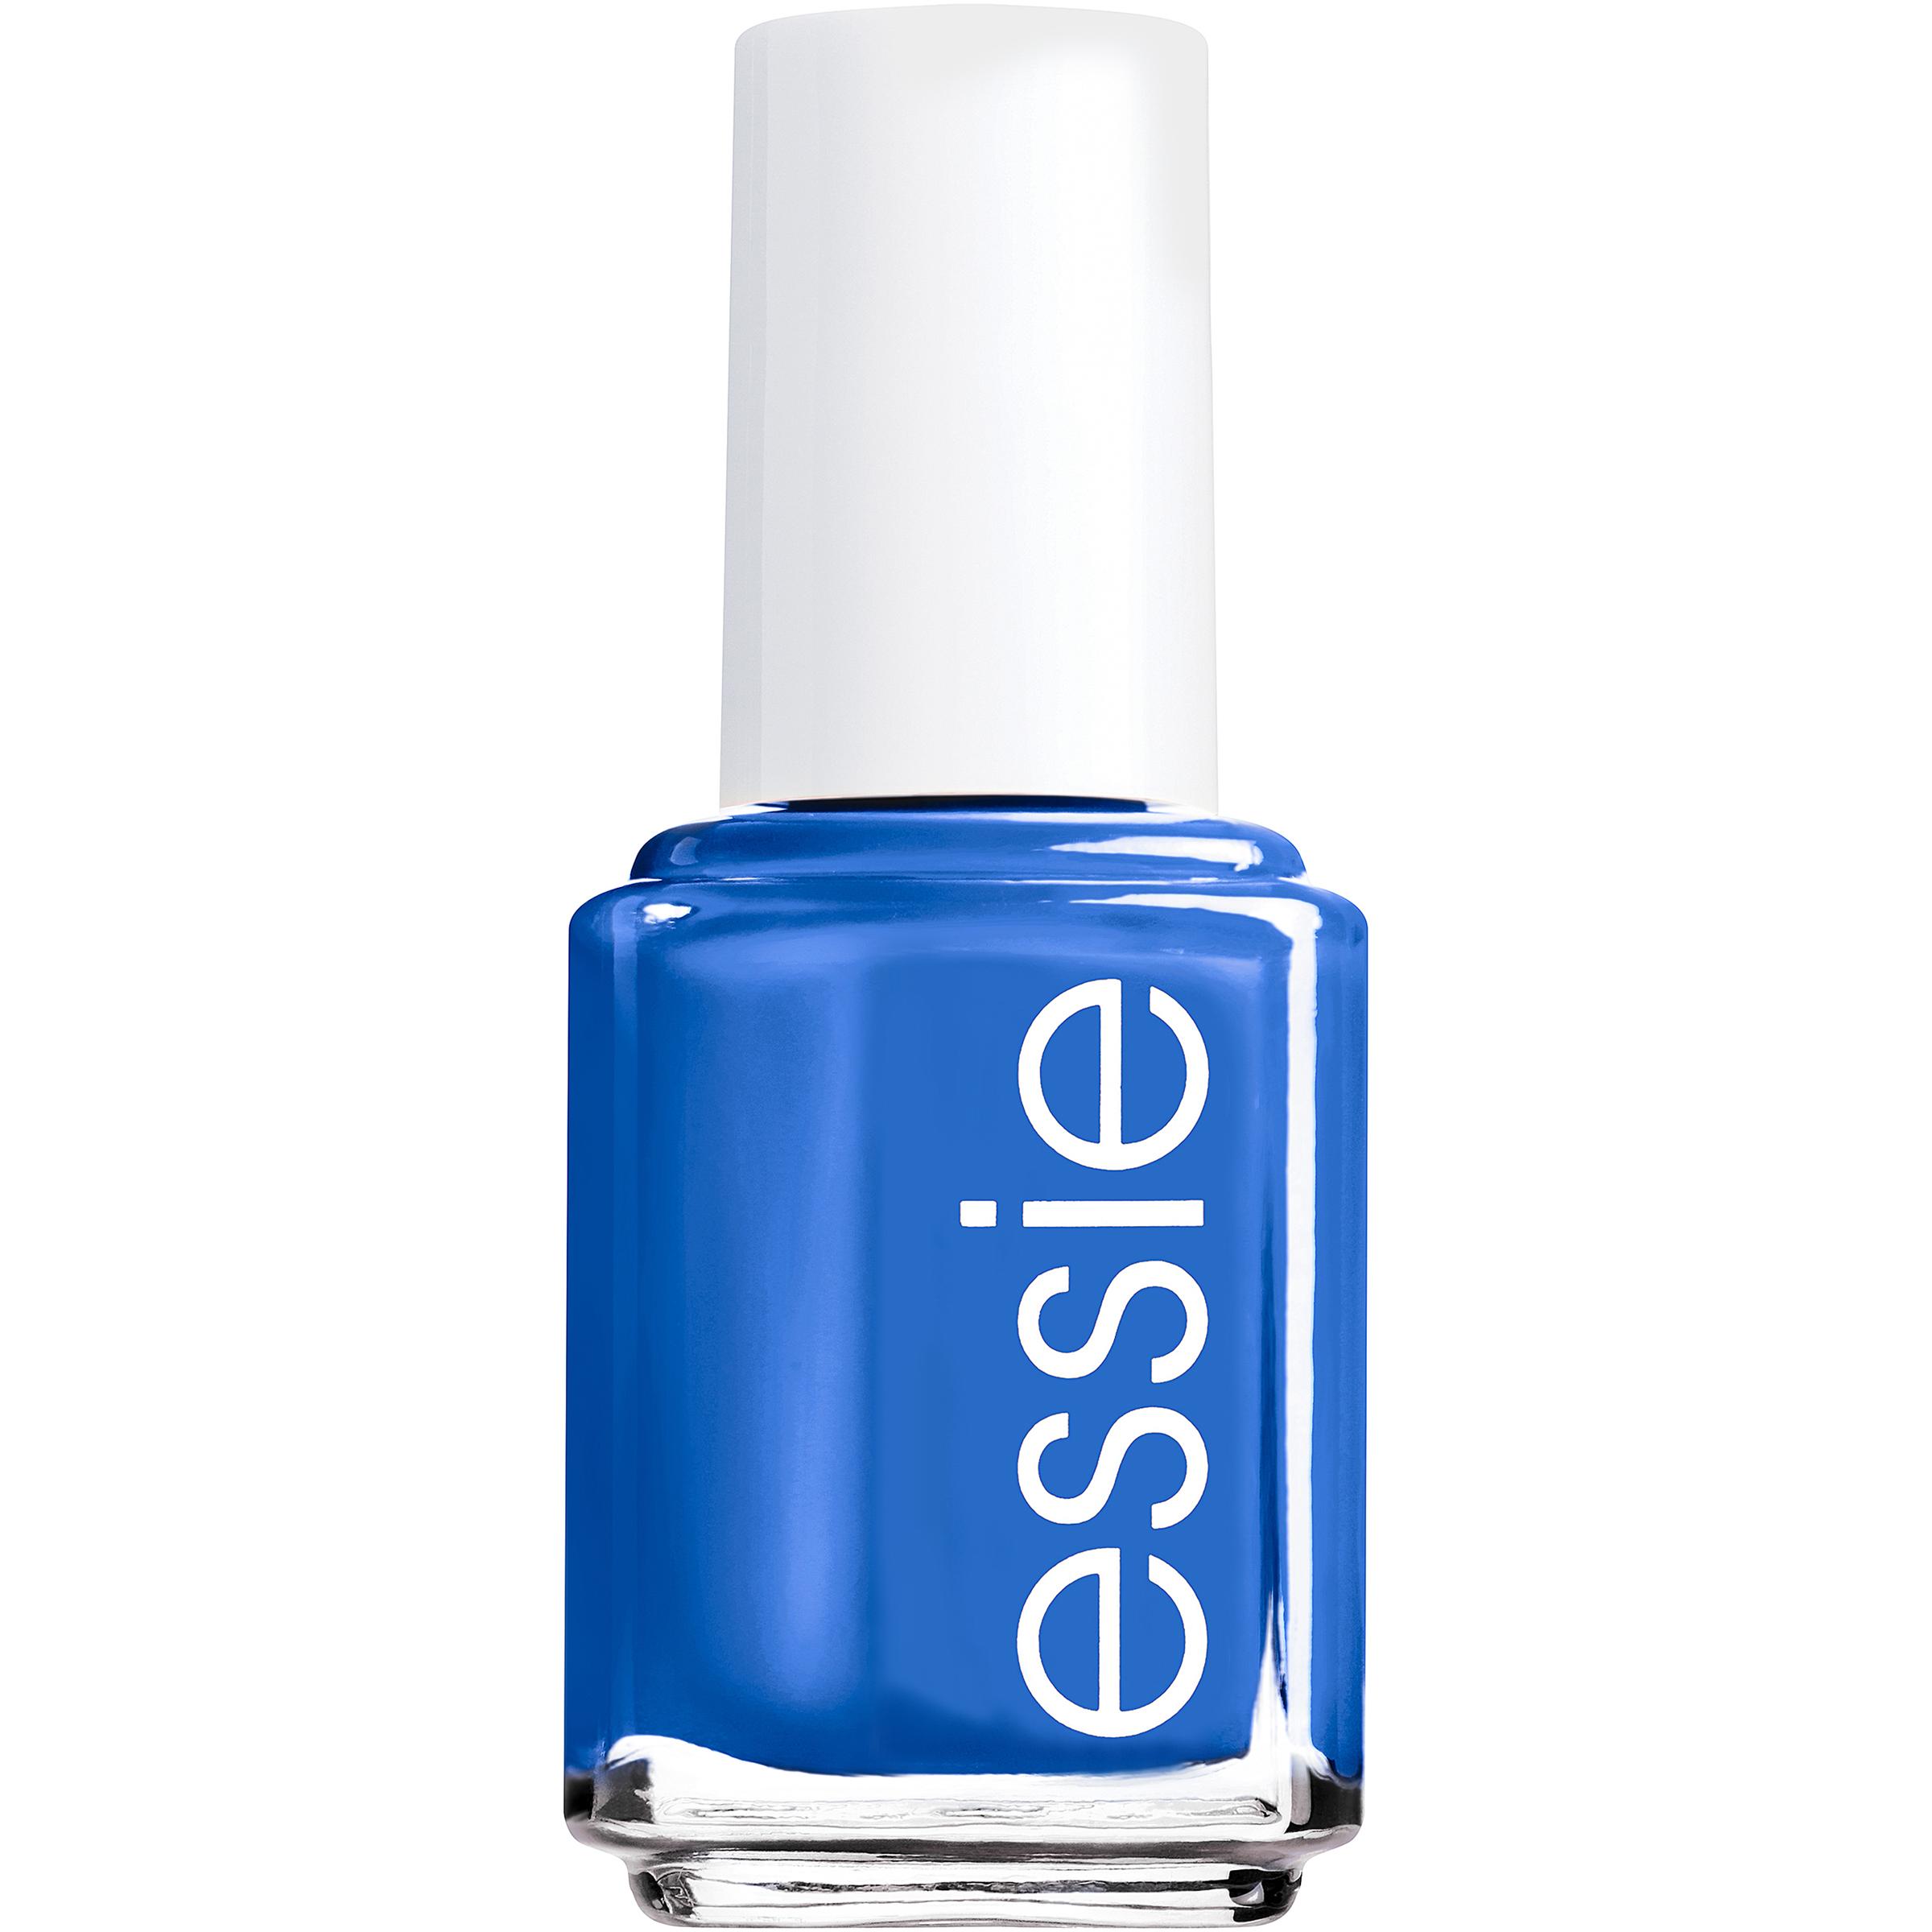 Essie Nail Polish (Blues) Butler Please, 0.46 fl oz - Walmart.com